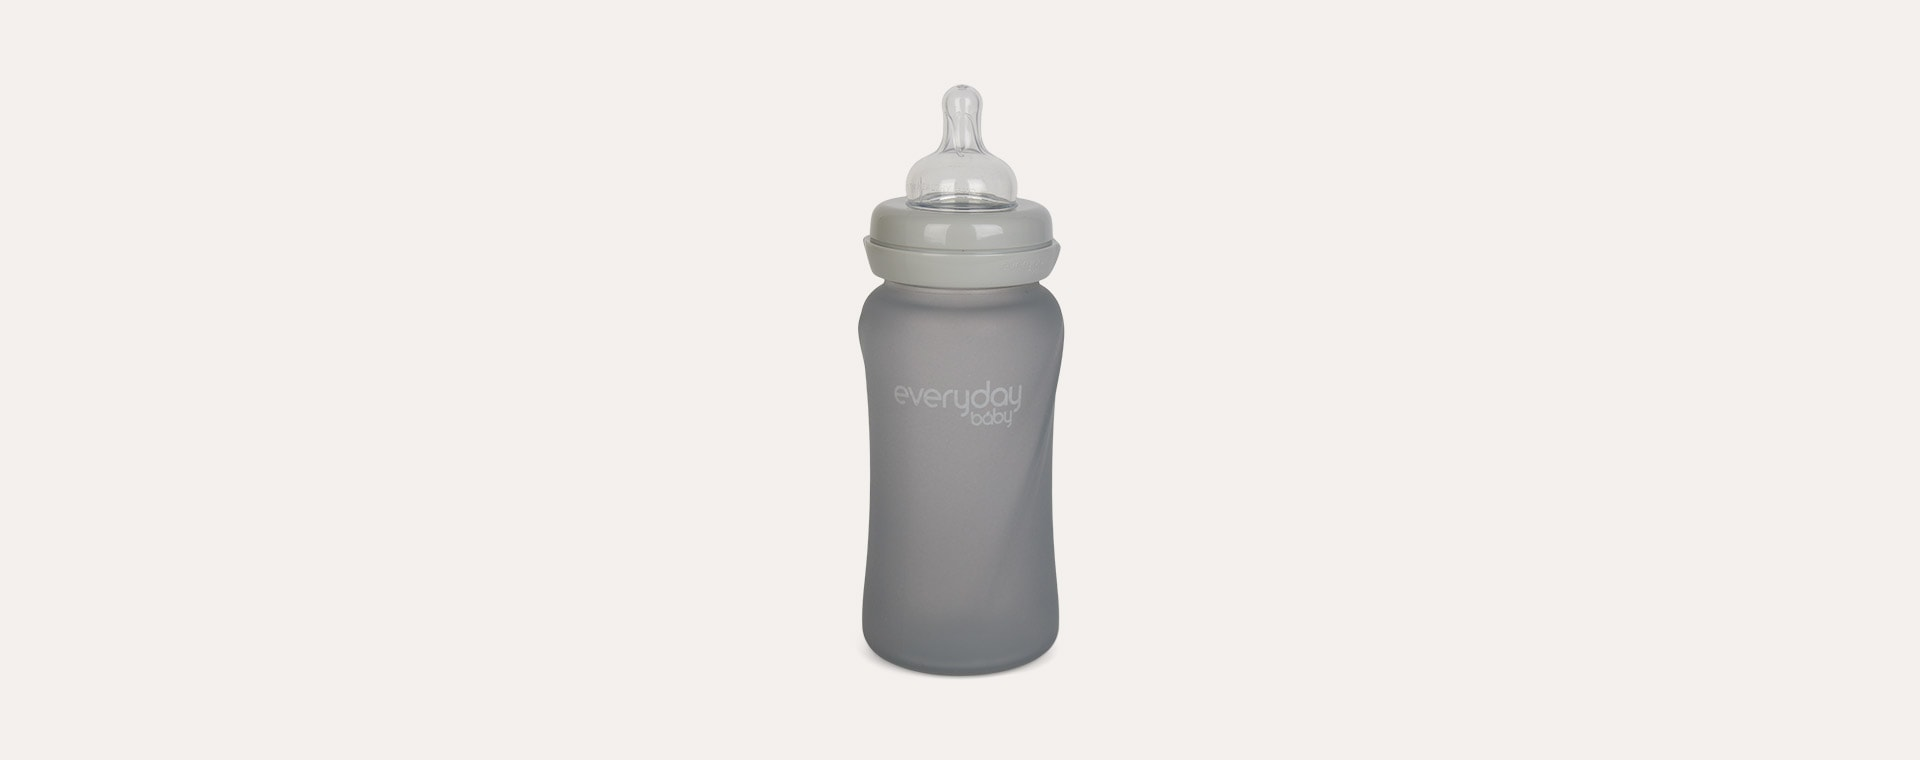 Grey Everyday Baby Glass Baby Bottle 240ml